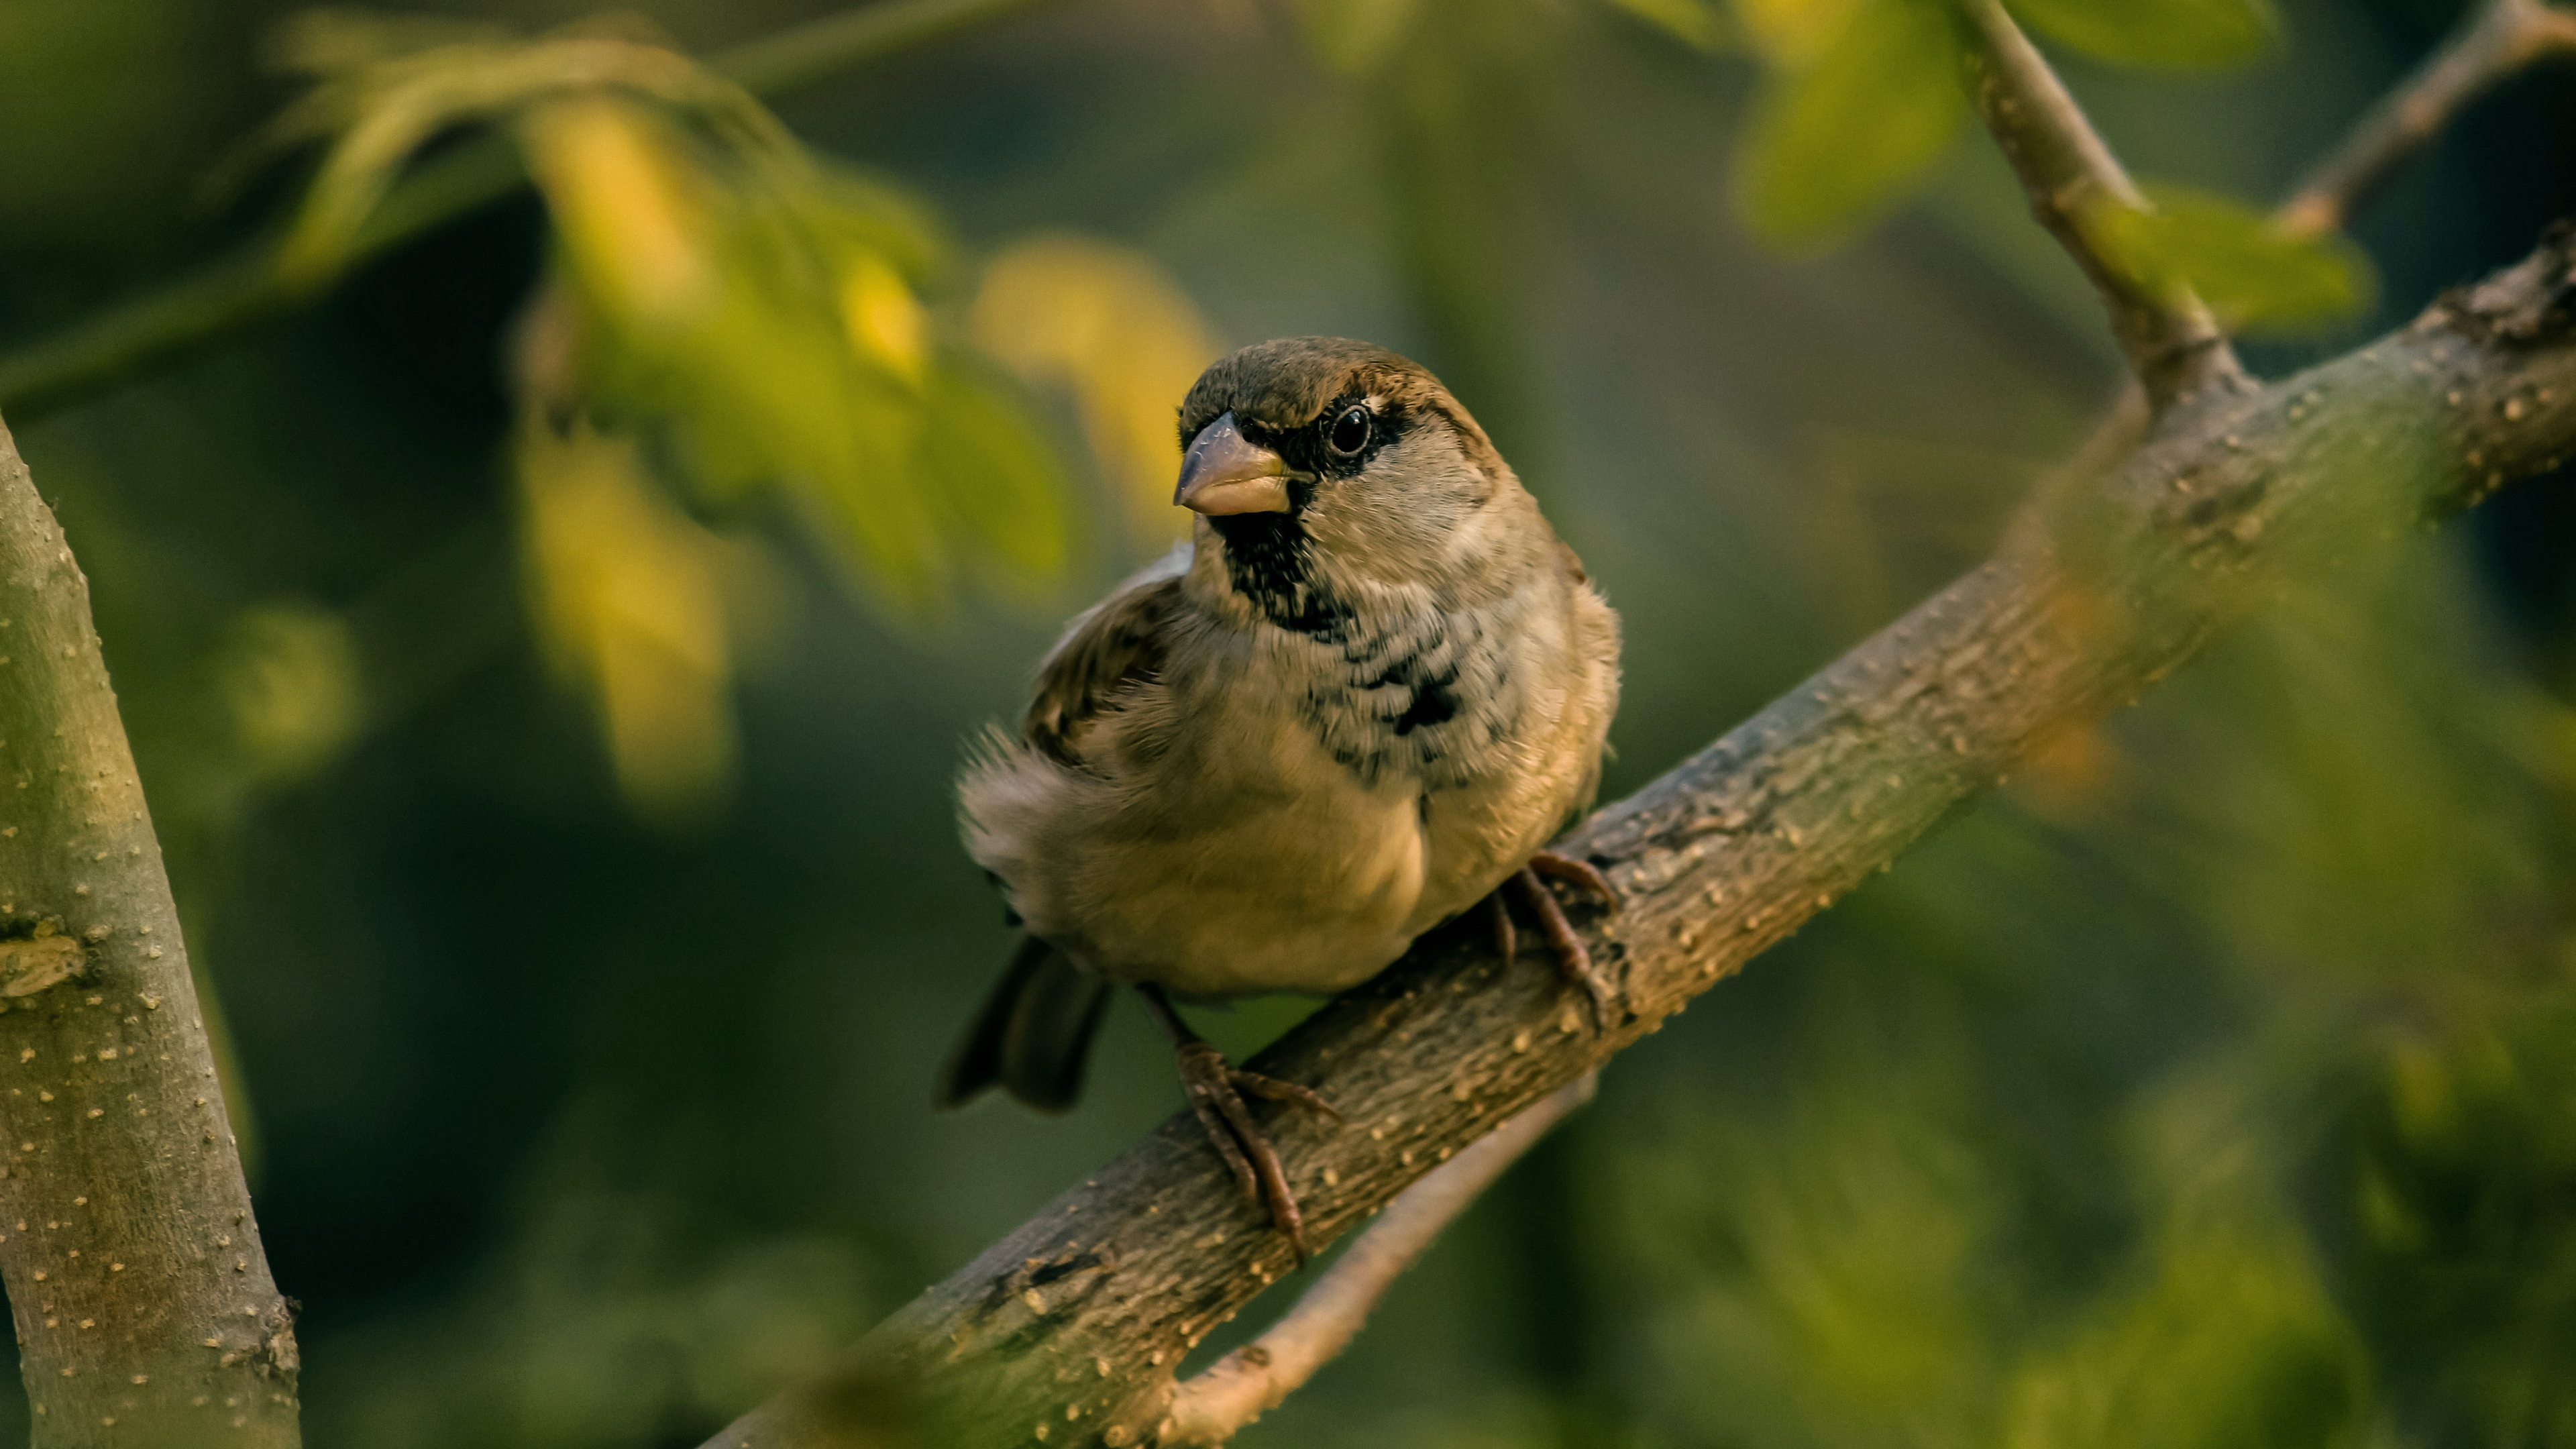 sparrow bird blur 4k 1542243033 - sparrow, bird, blur 4k - Sparrow, Blur, Bird